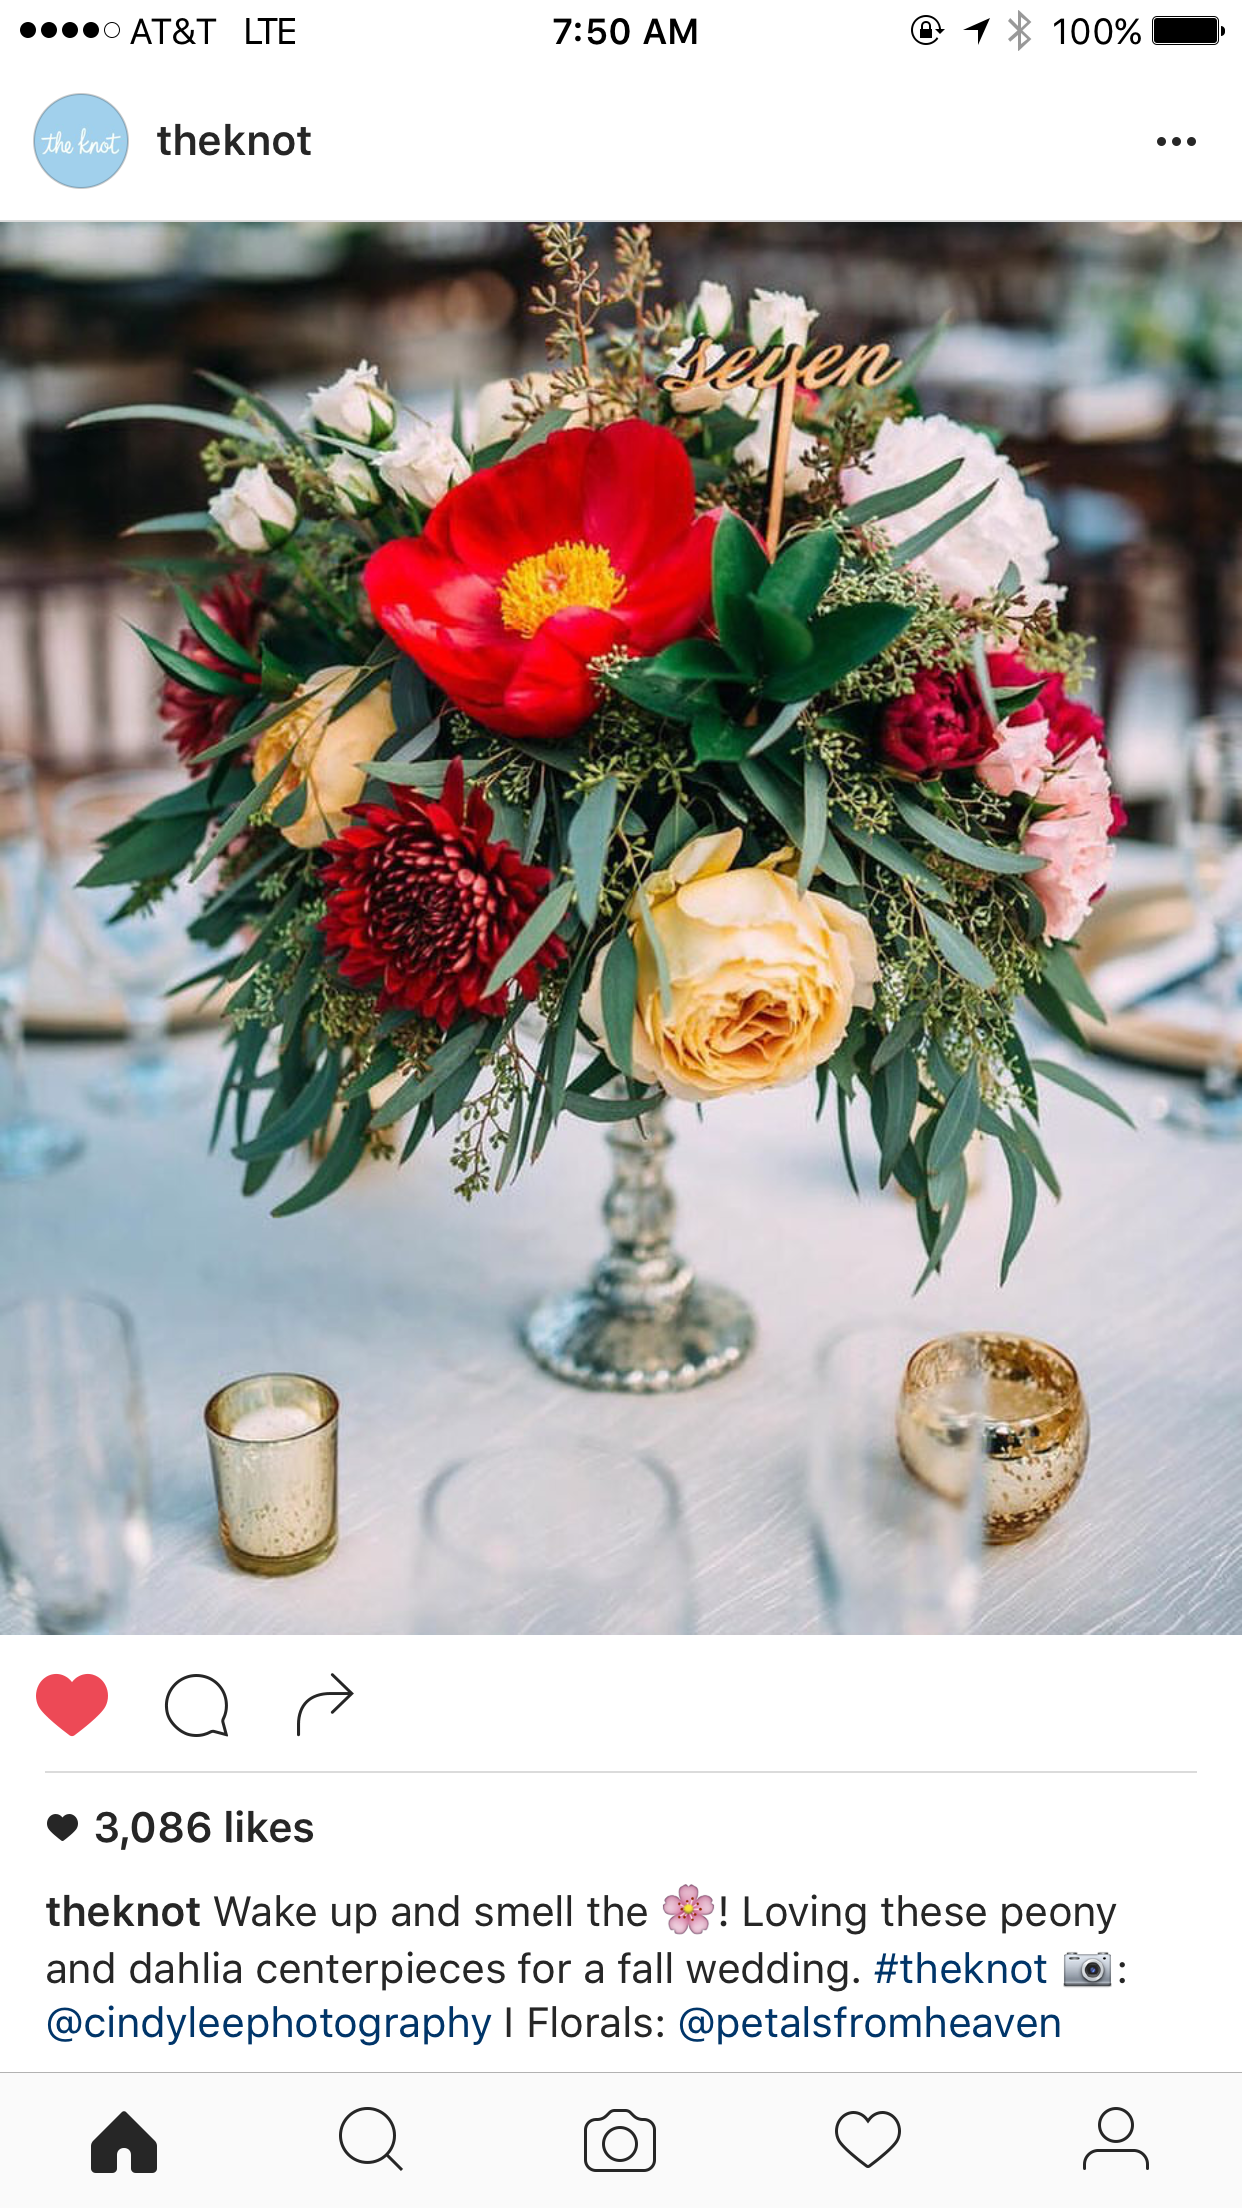 Pin by cristina costales on cristina u bj floral wedding inspo